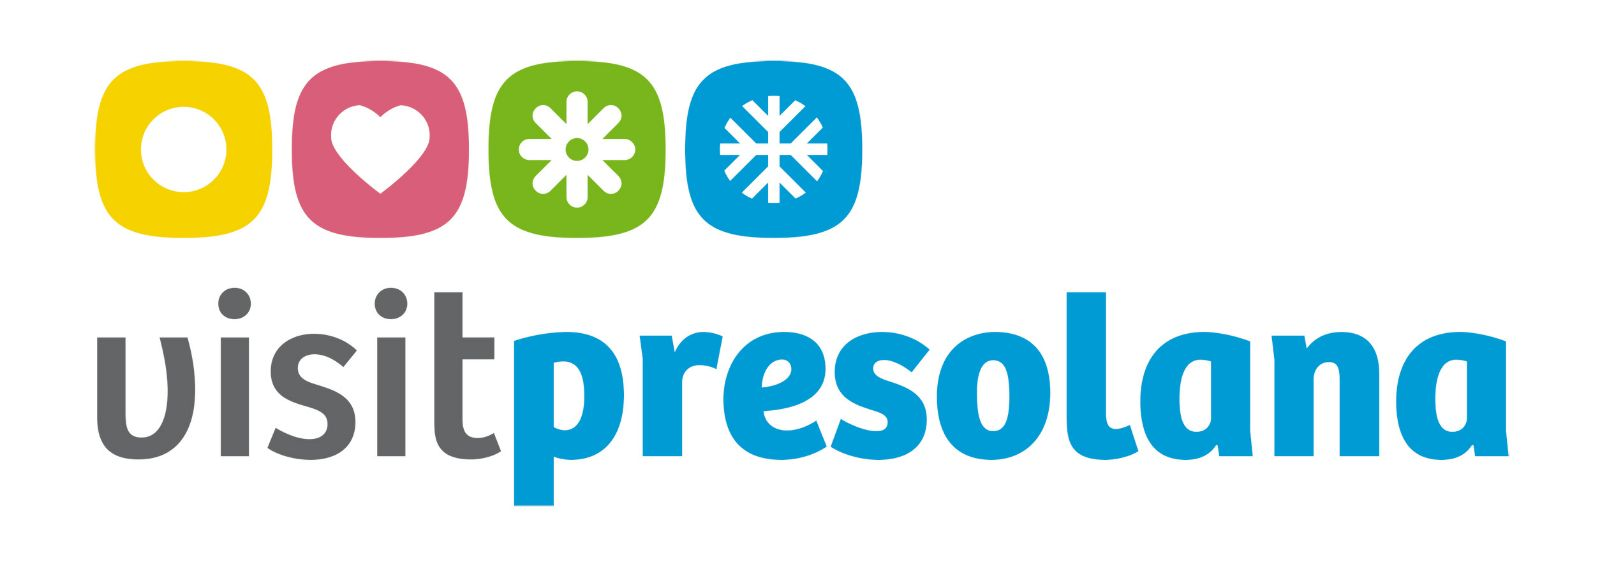 visit turismo Presolana Hotel